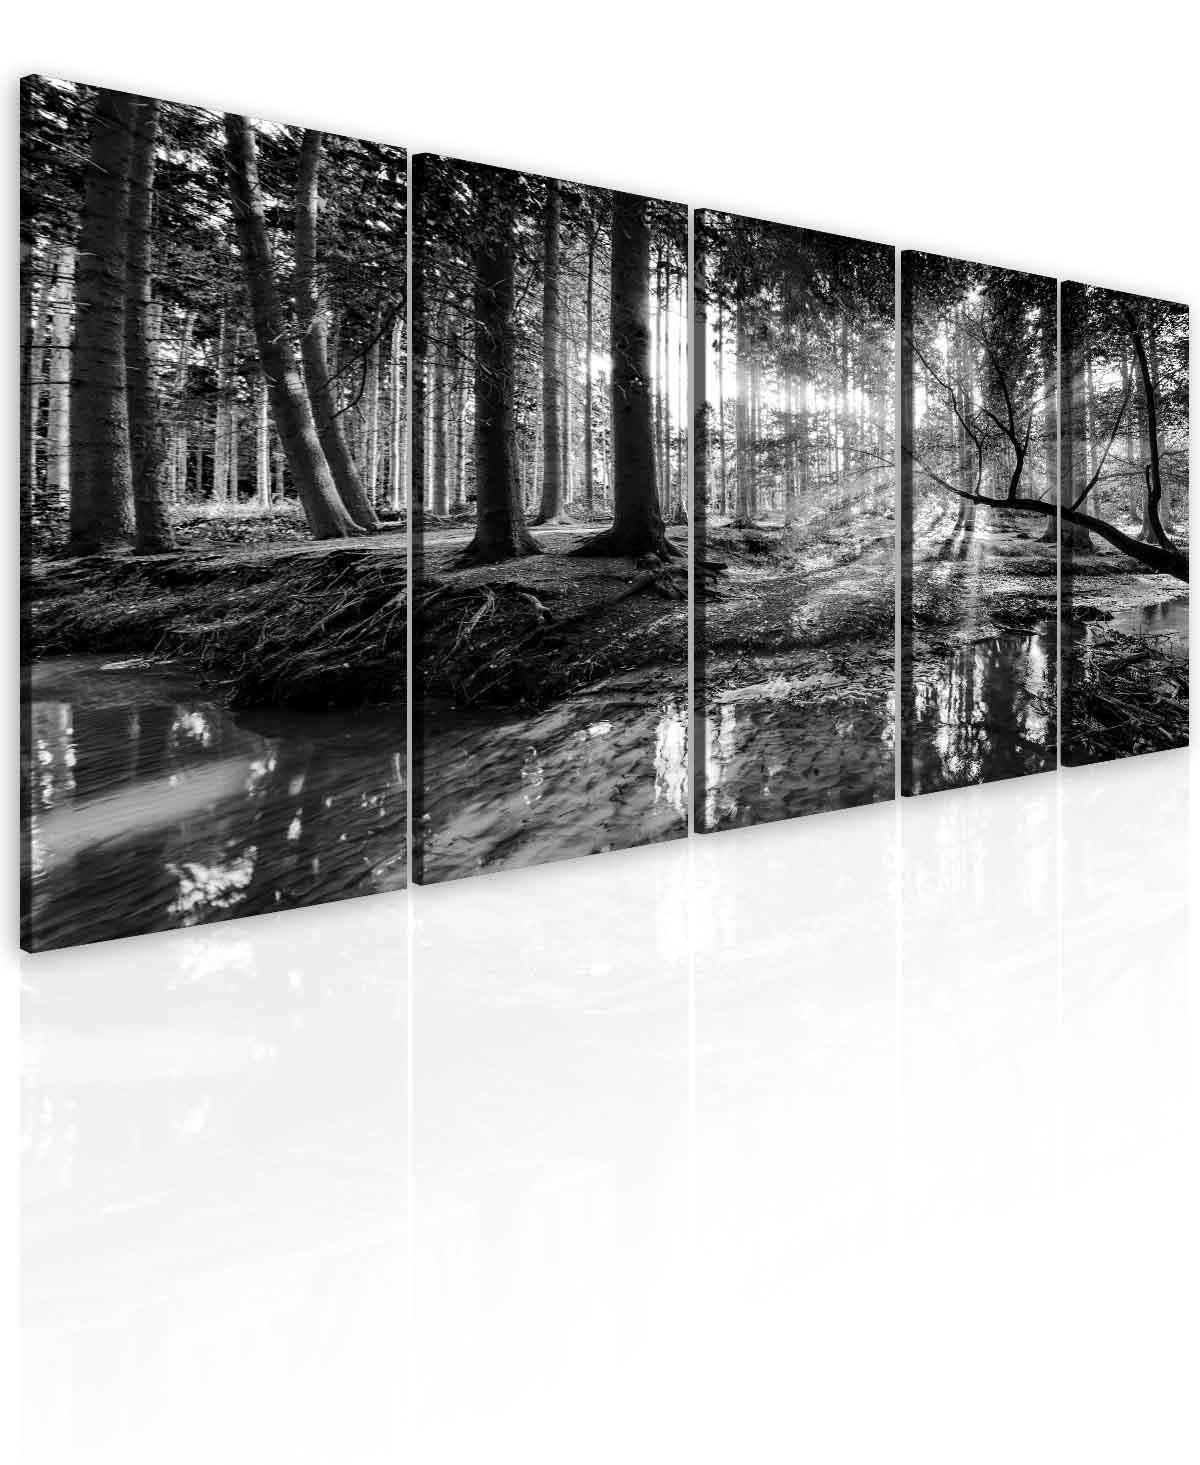 Malvis Obraz èernobílá pohoda lesa  - zvìtšit obrázek